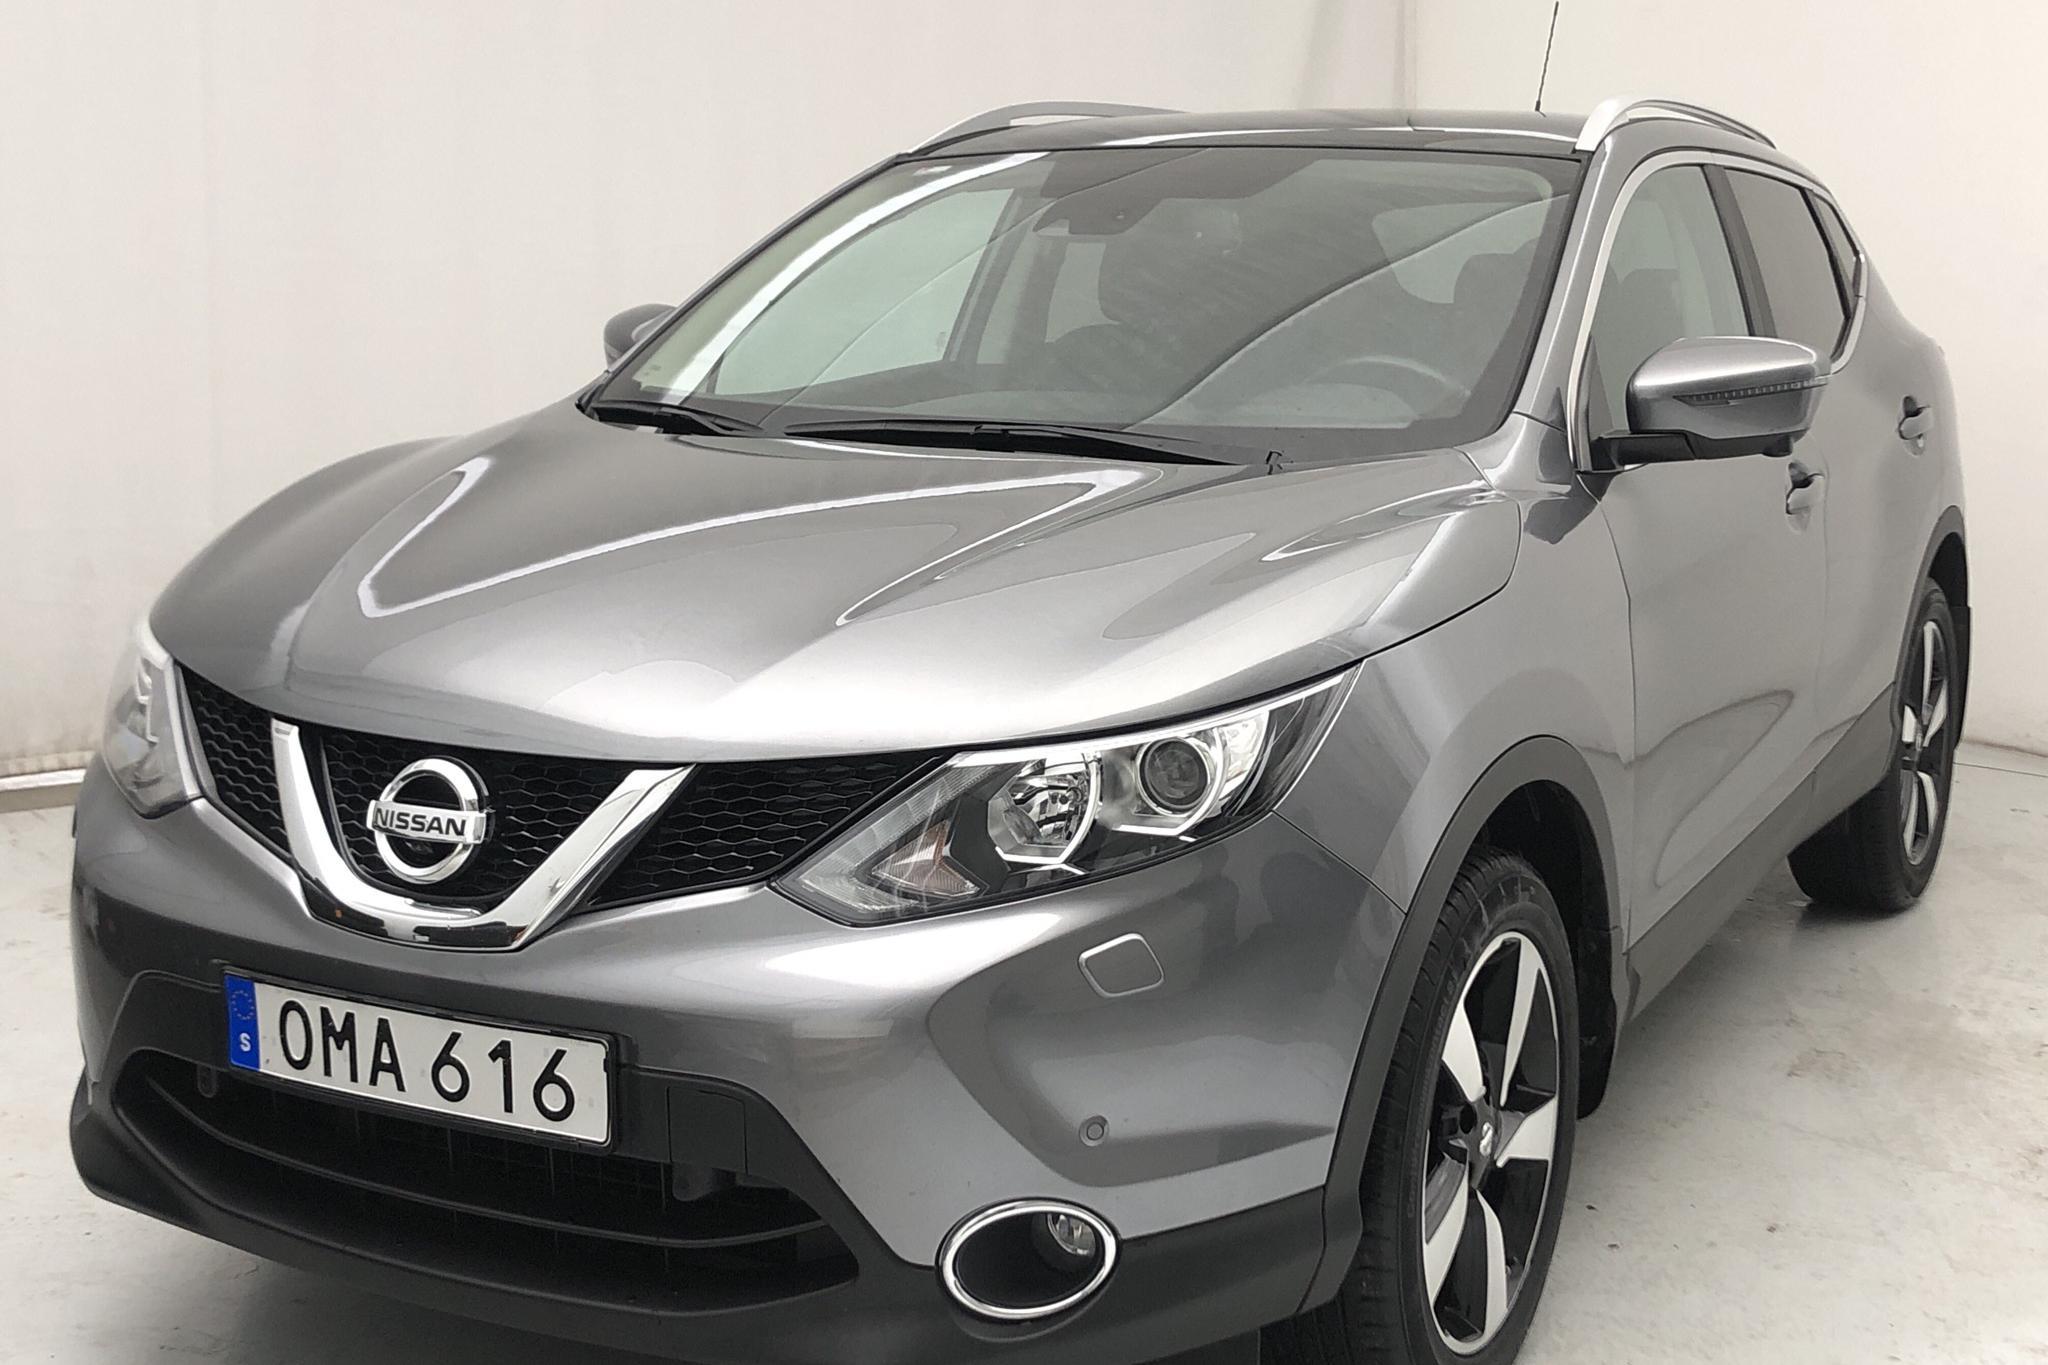 Nissan Qashqai 1.6 dCi (130hk) - 63 600 km - Manual - gray - 2017